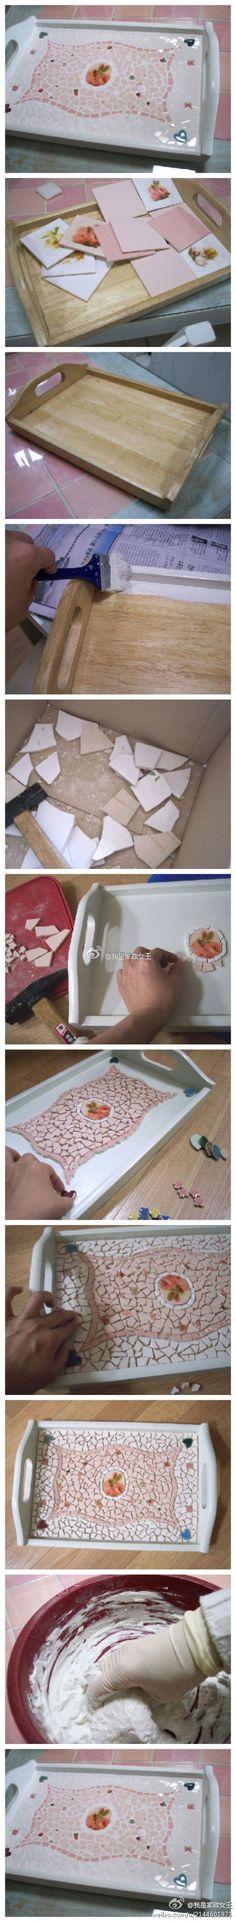 diy ideas, diy crafts, diy tutorial, serving trays, mosaic tables, broken china, mosaic tiles, craft ideas, christmas gifts